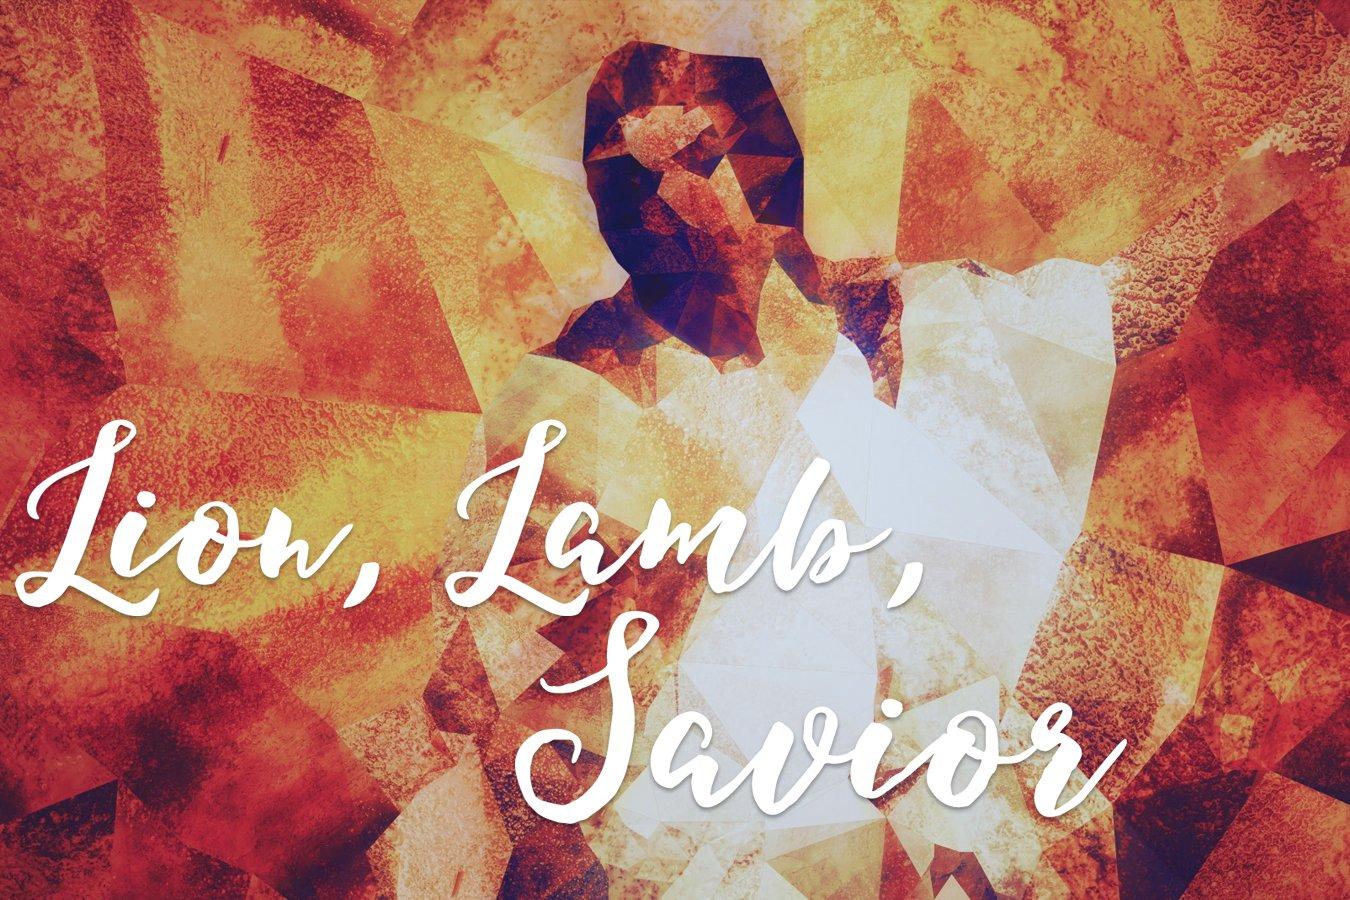 Lion,  Lamb, and Savior